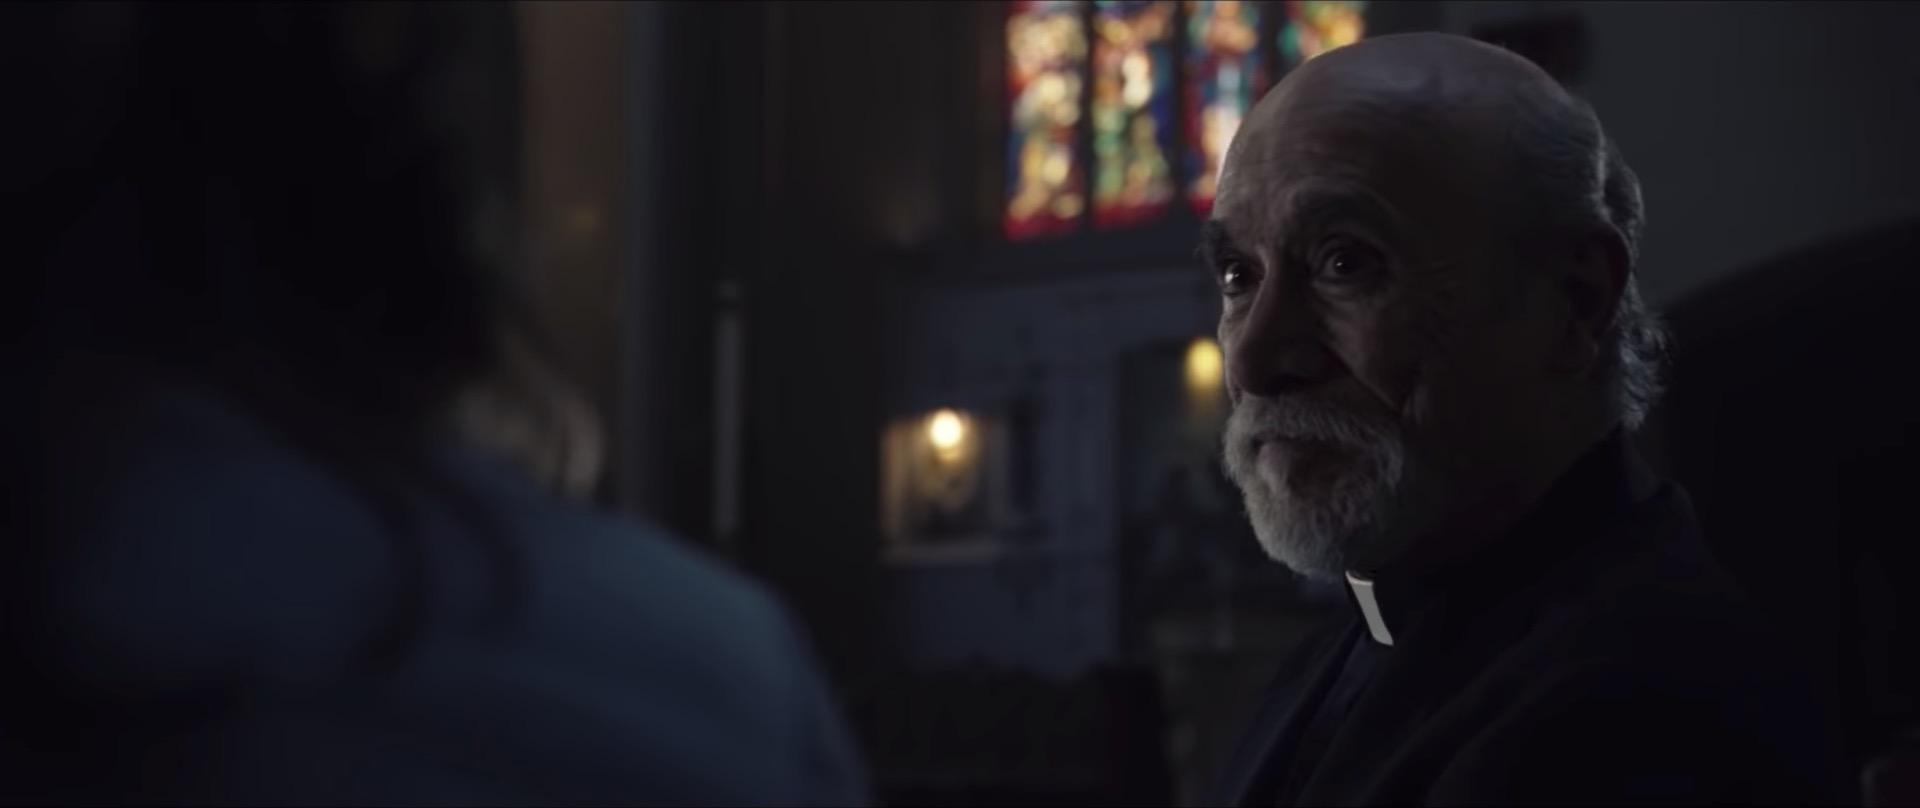 The Curse Of La Llorona Trailer Is Pure Horror